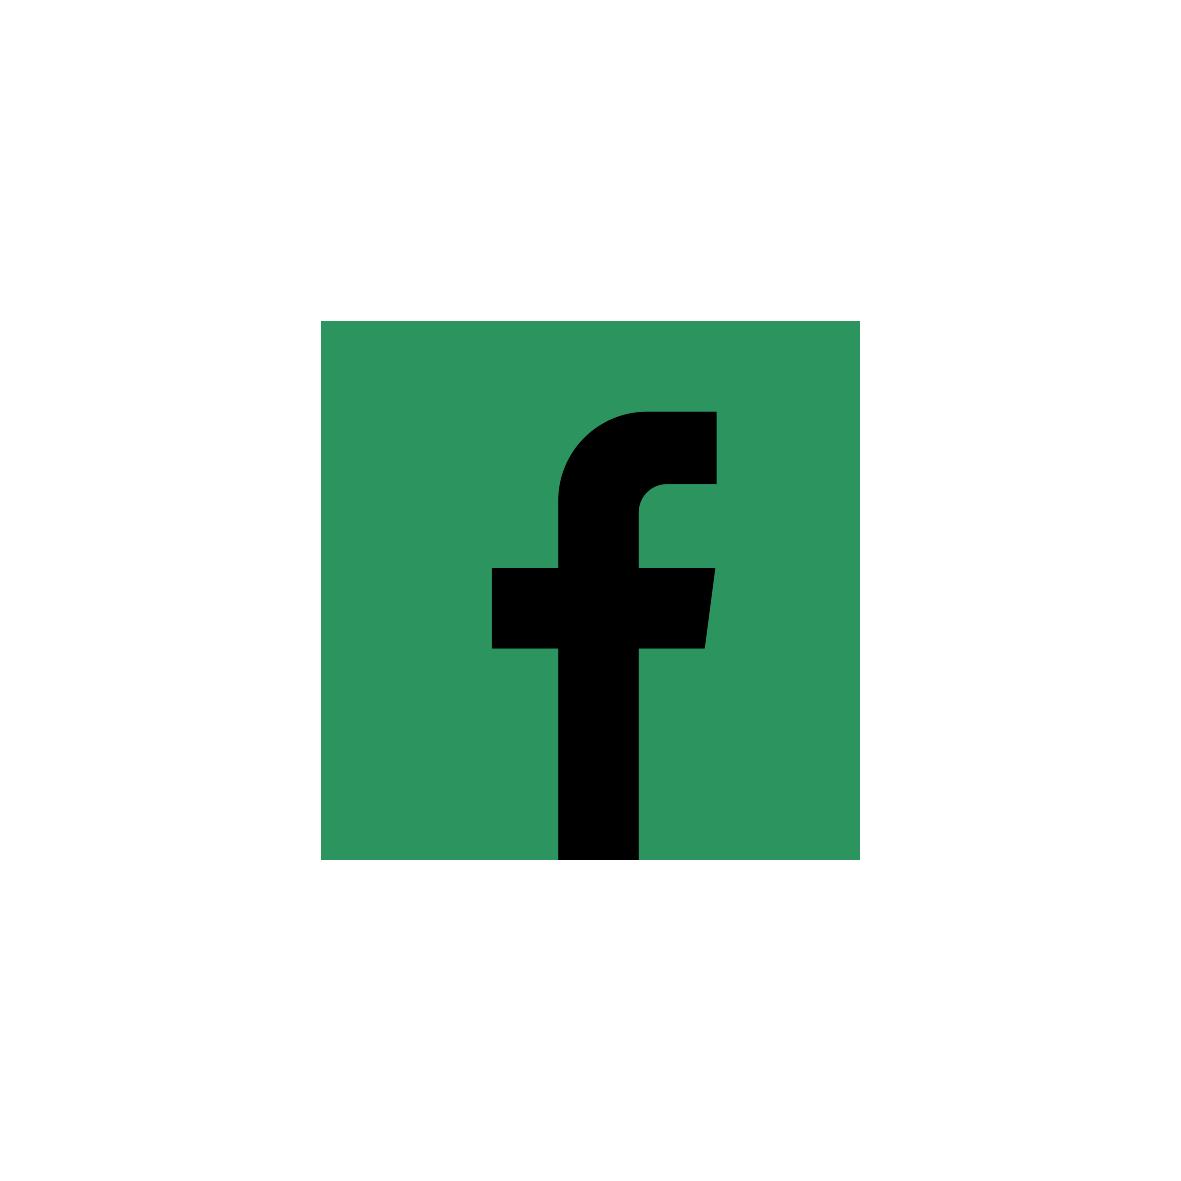 fb_green_01